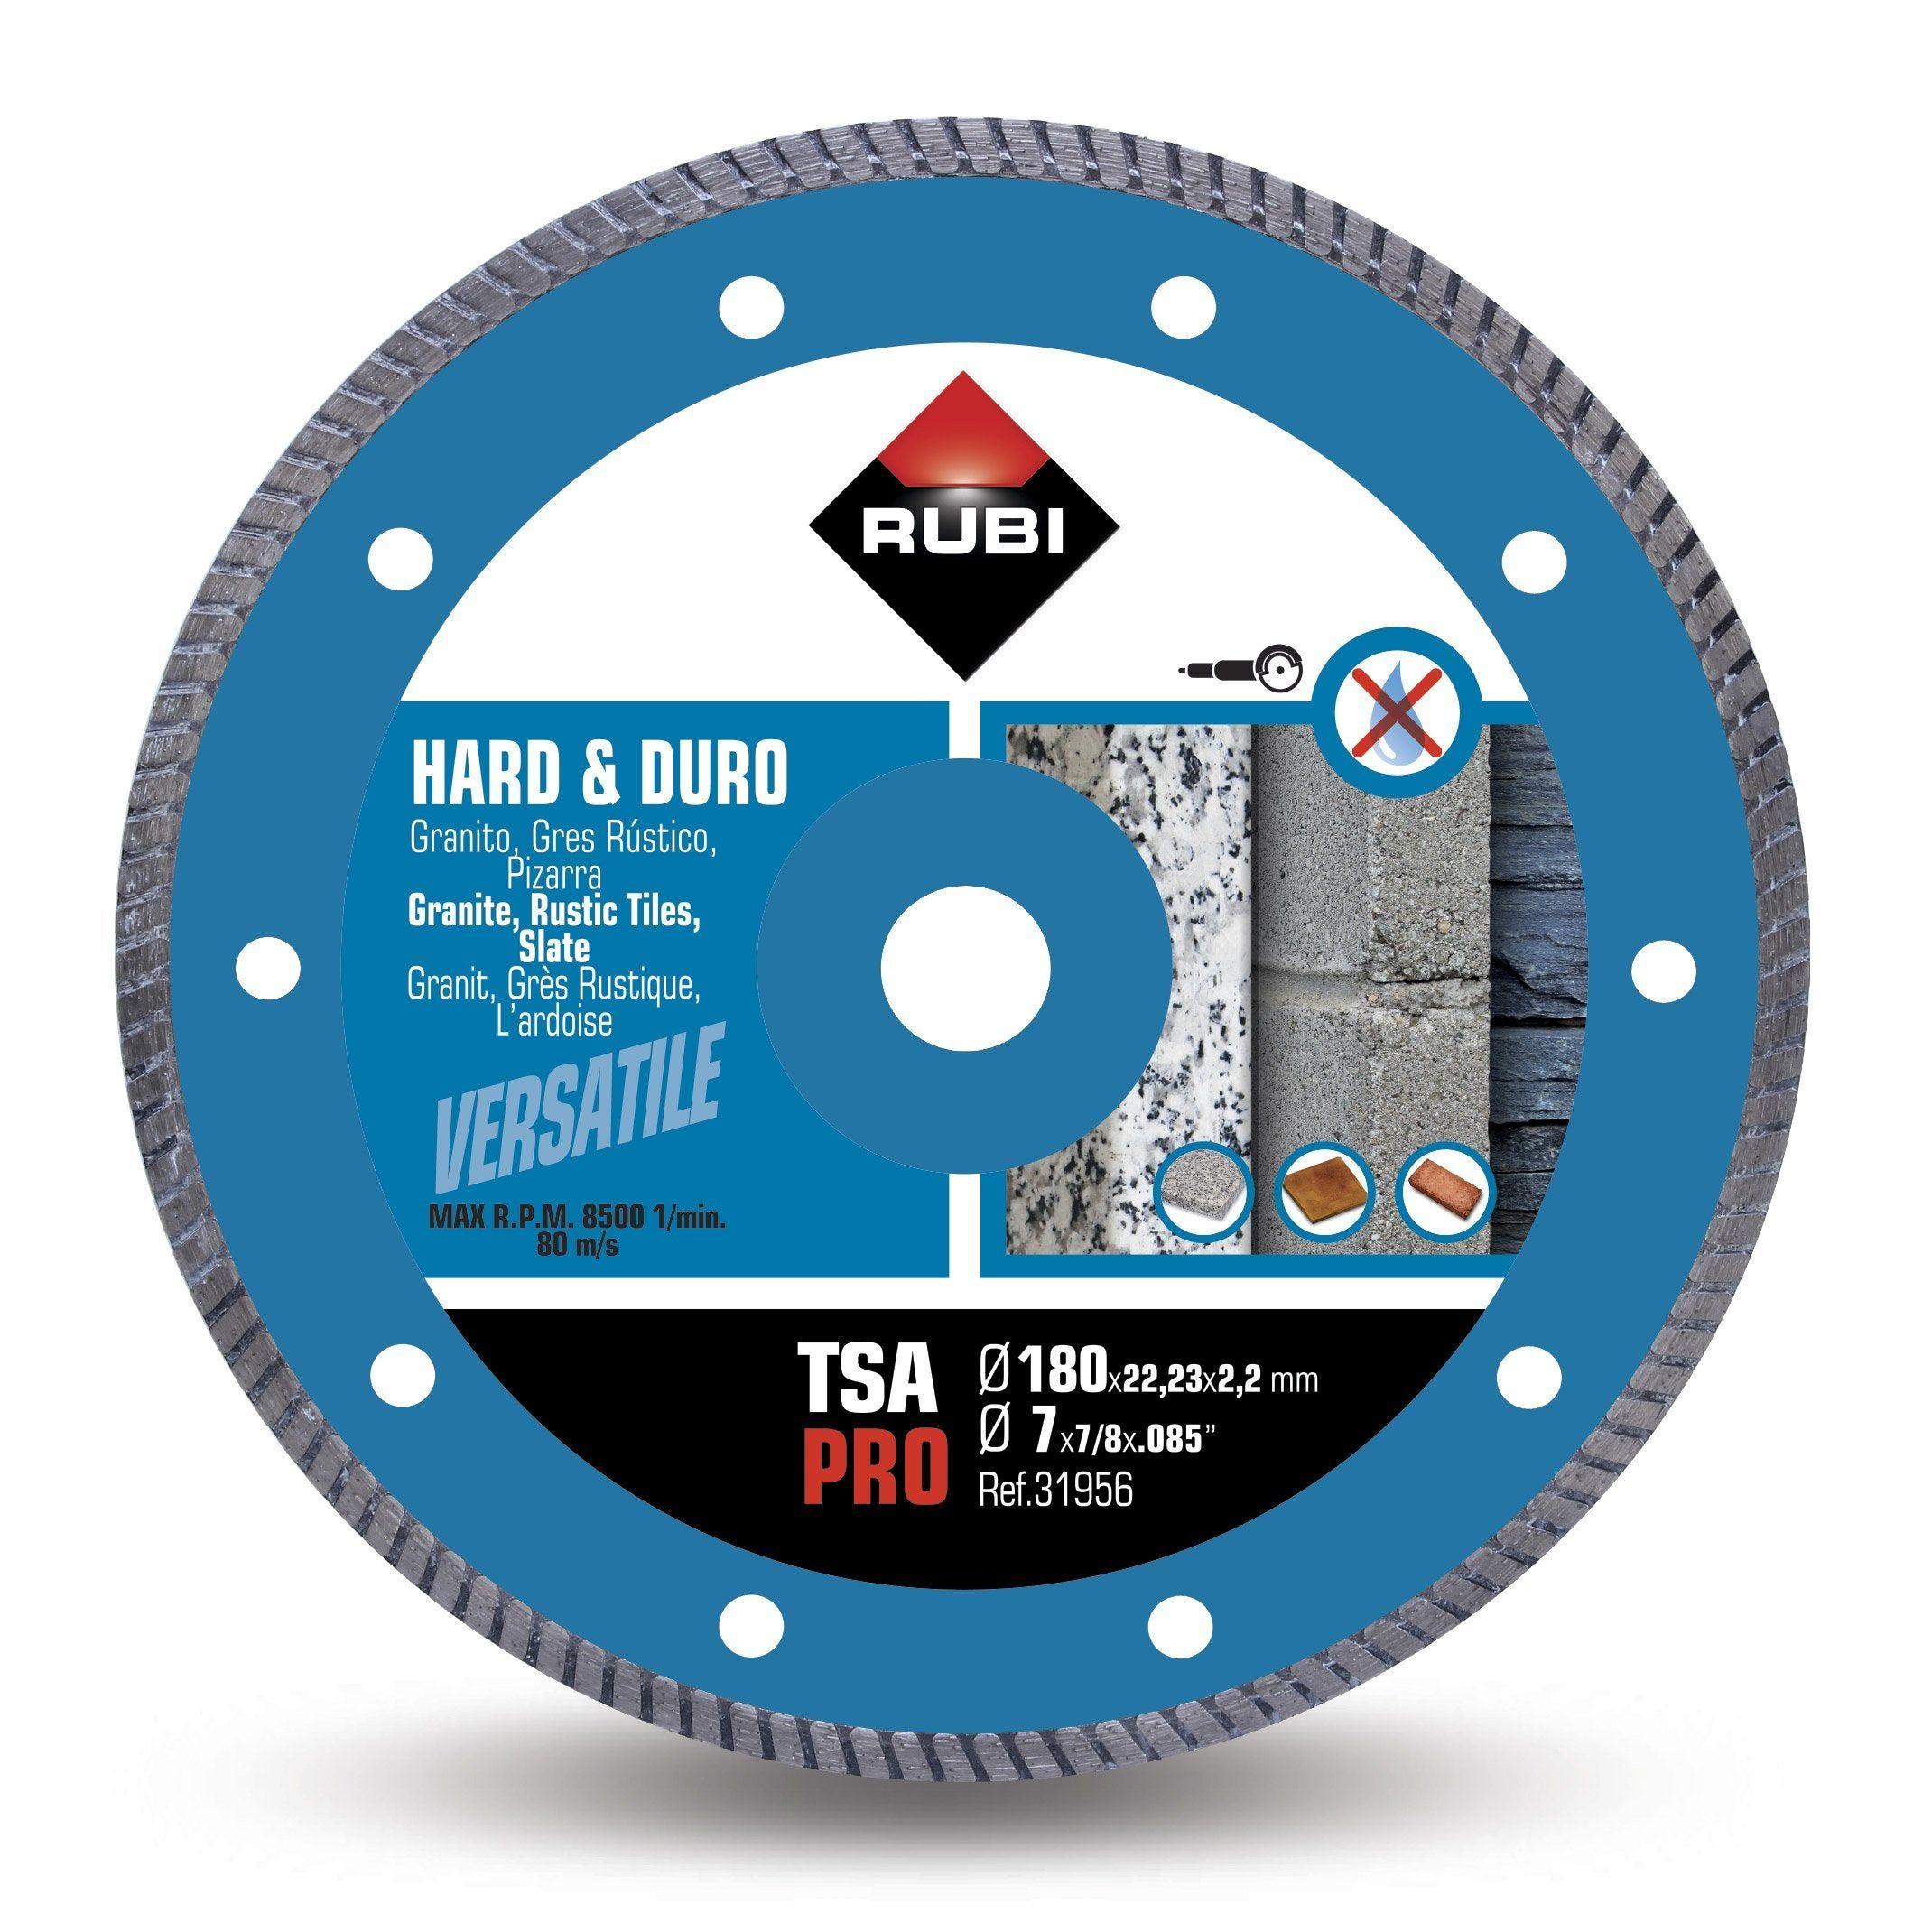 Disque Diamant Turbo Rubi Tsa 180 Pro 180 Mm Disque Diamant Diamant Et Rubis